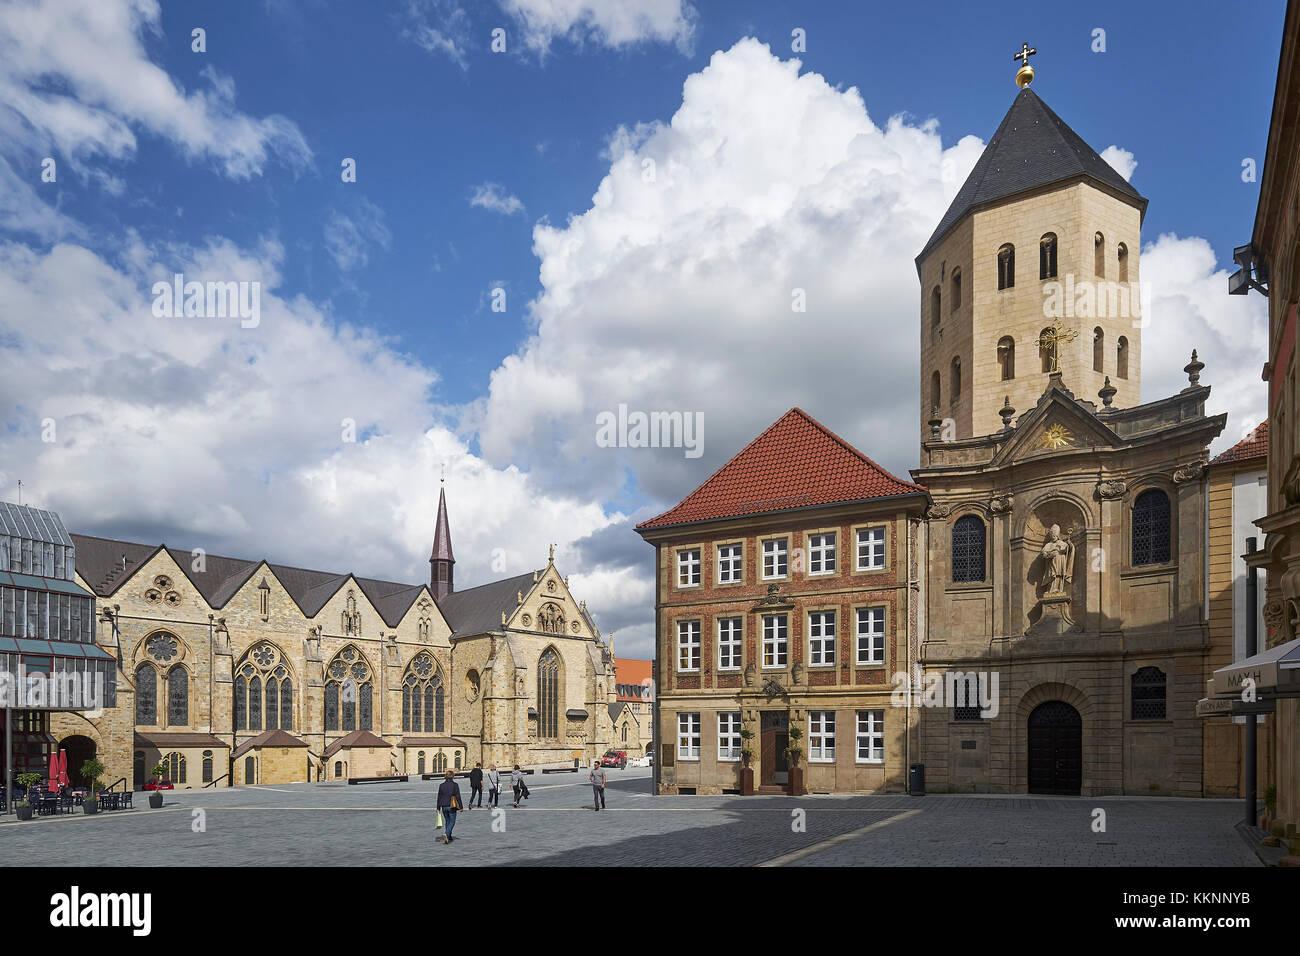 Len Paderborn paderborn stock photos paderborn stock images alamy